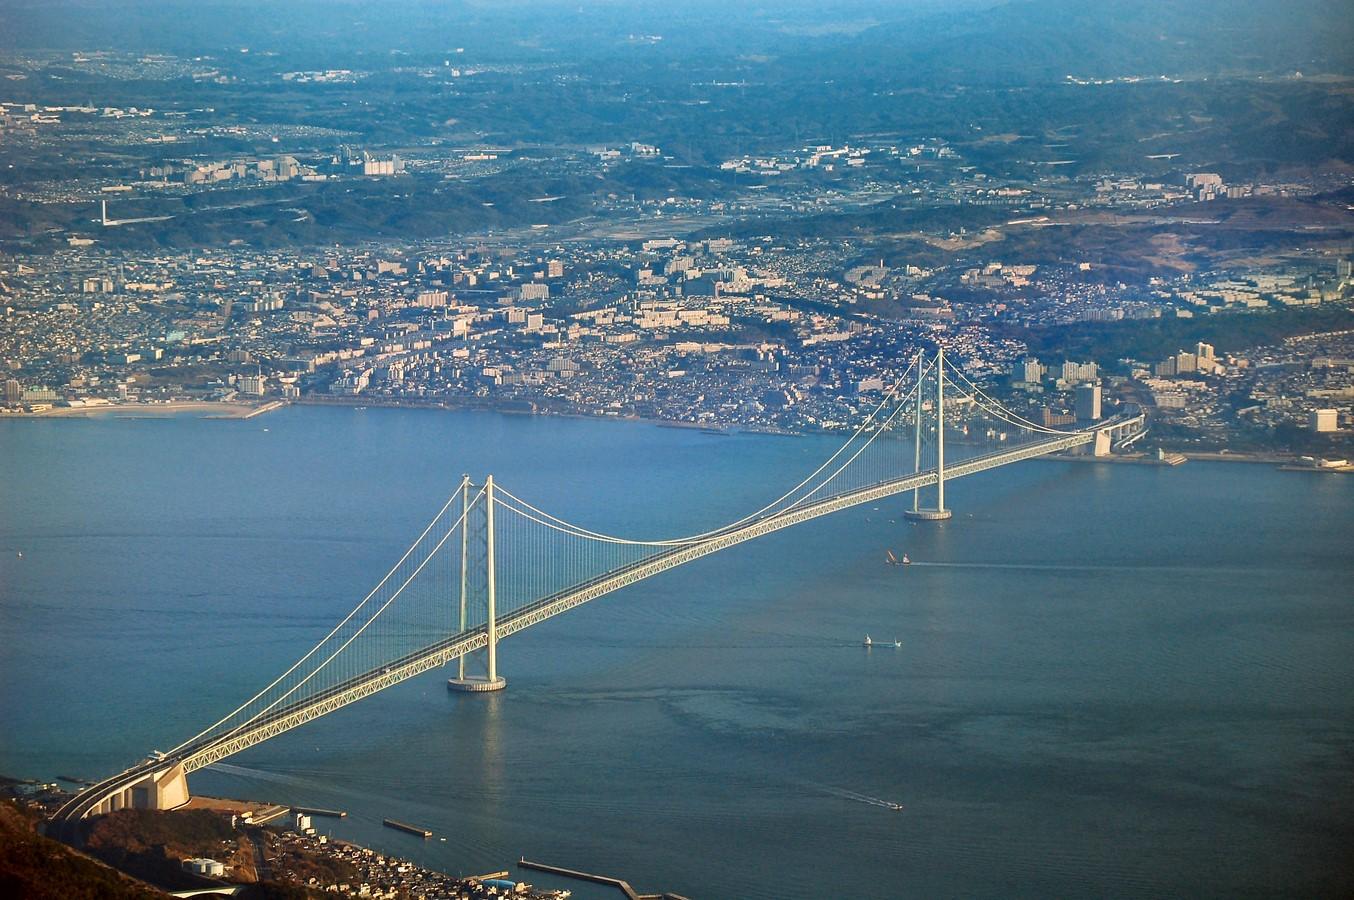 Akashi Kaikyo Bridge, Japan by Satoshi Kashima- The Longest Suspension Bridge in the World - Sheet11